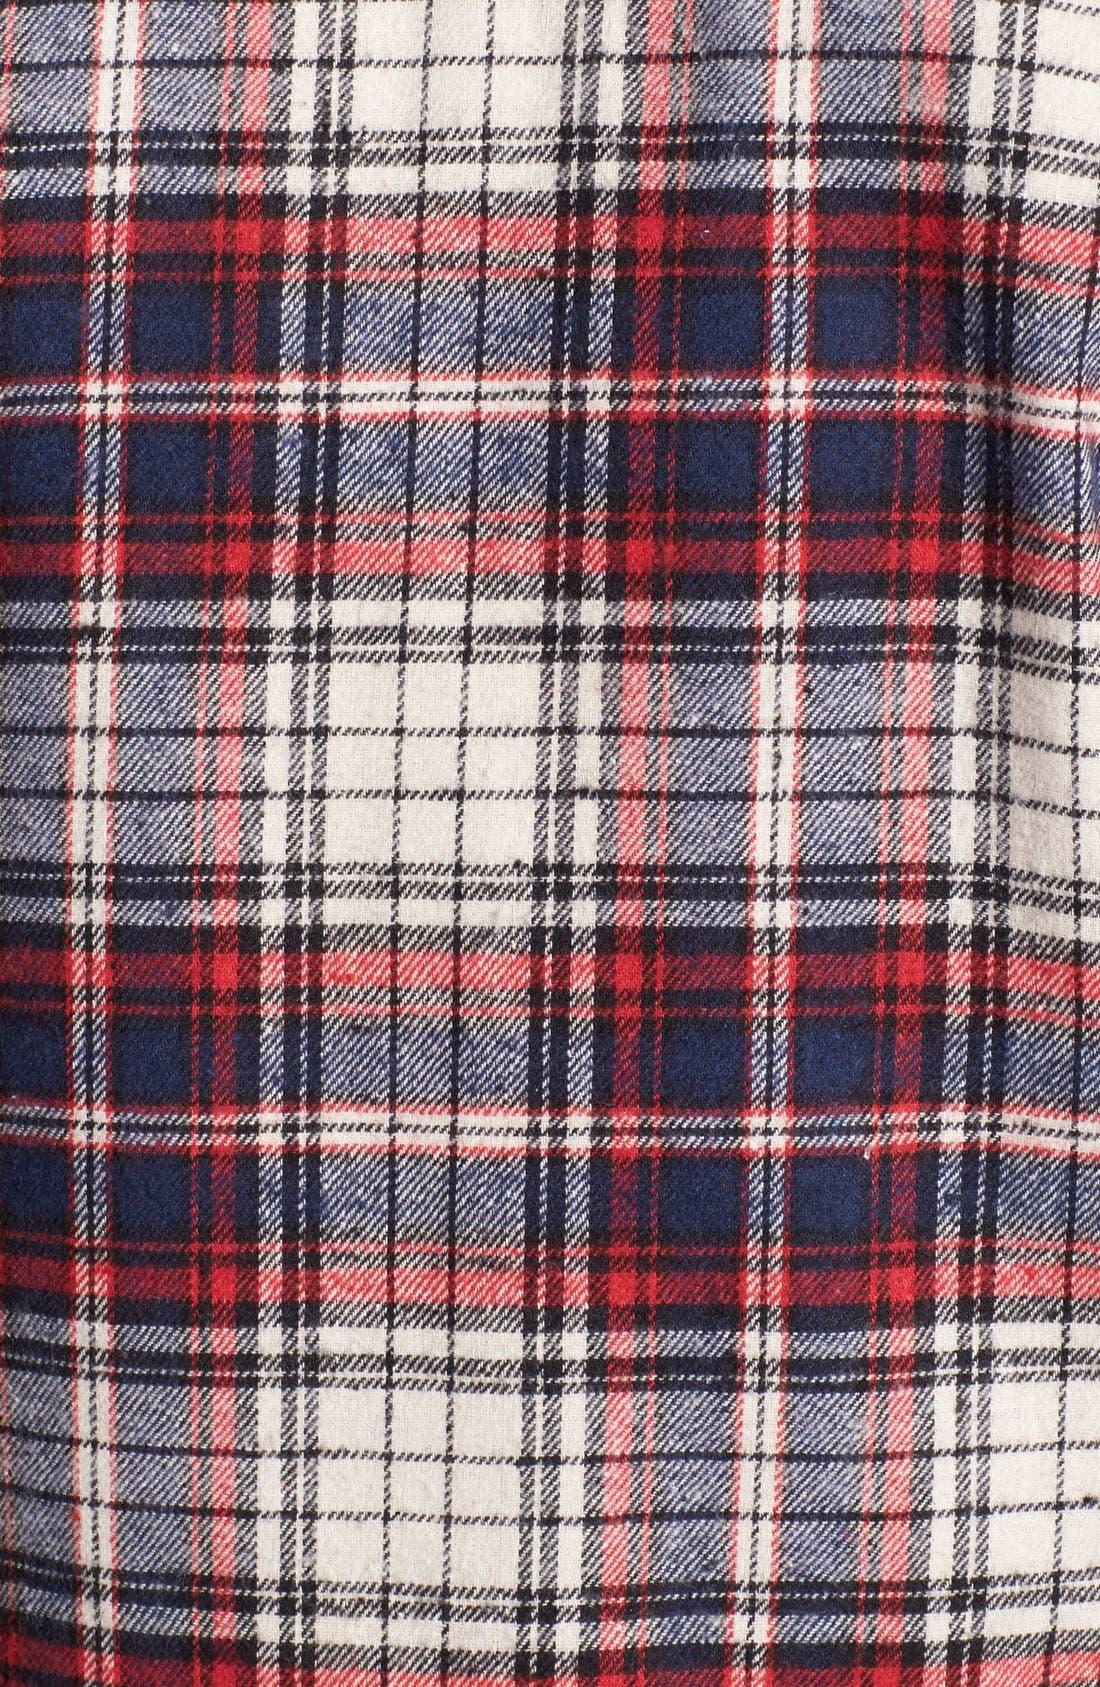 Alternate Image 3  - Kane & Unke 'Darin's Fave' Plaid Flannel Shirt